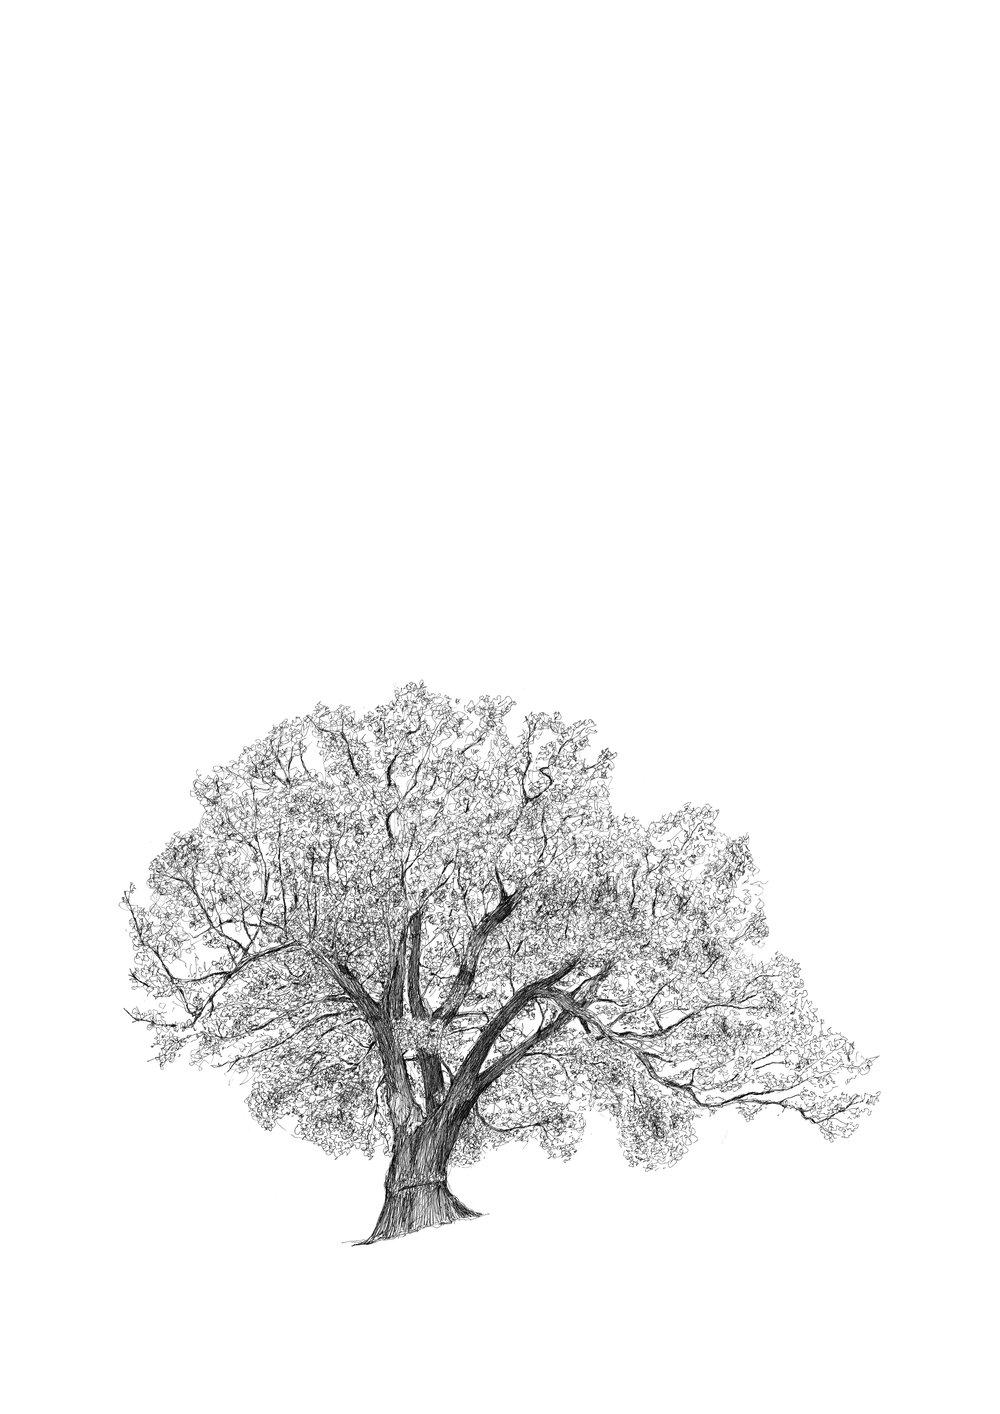 The Brockwell Park Oak